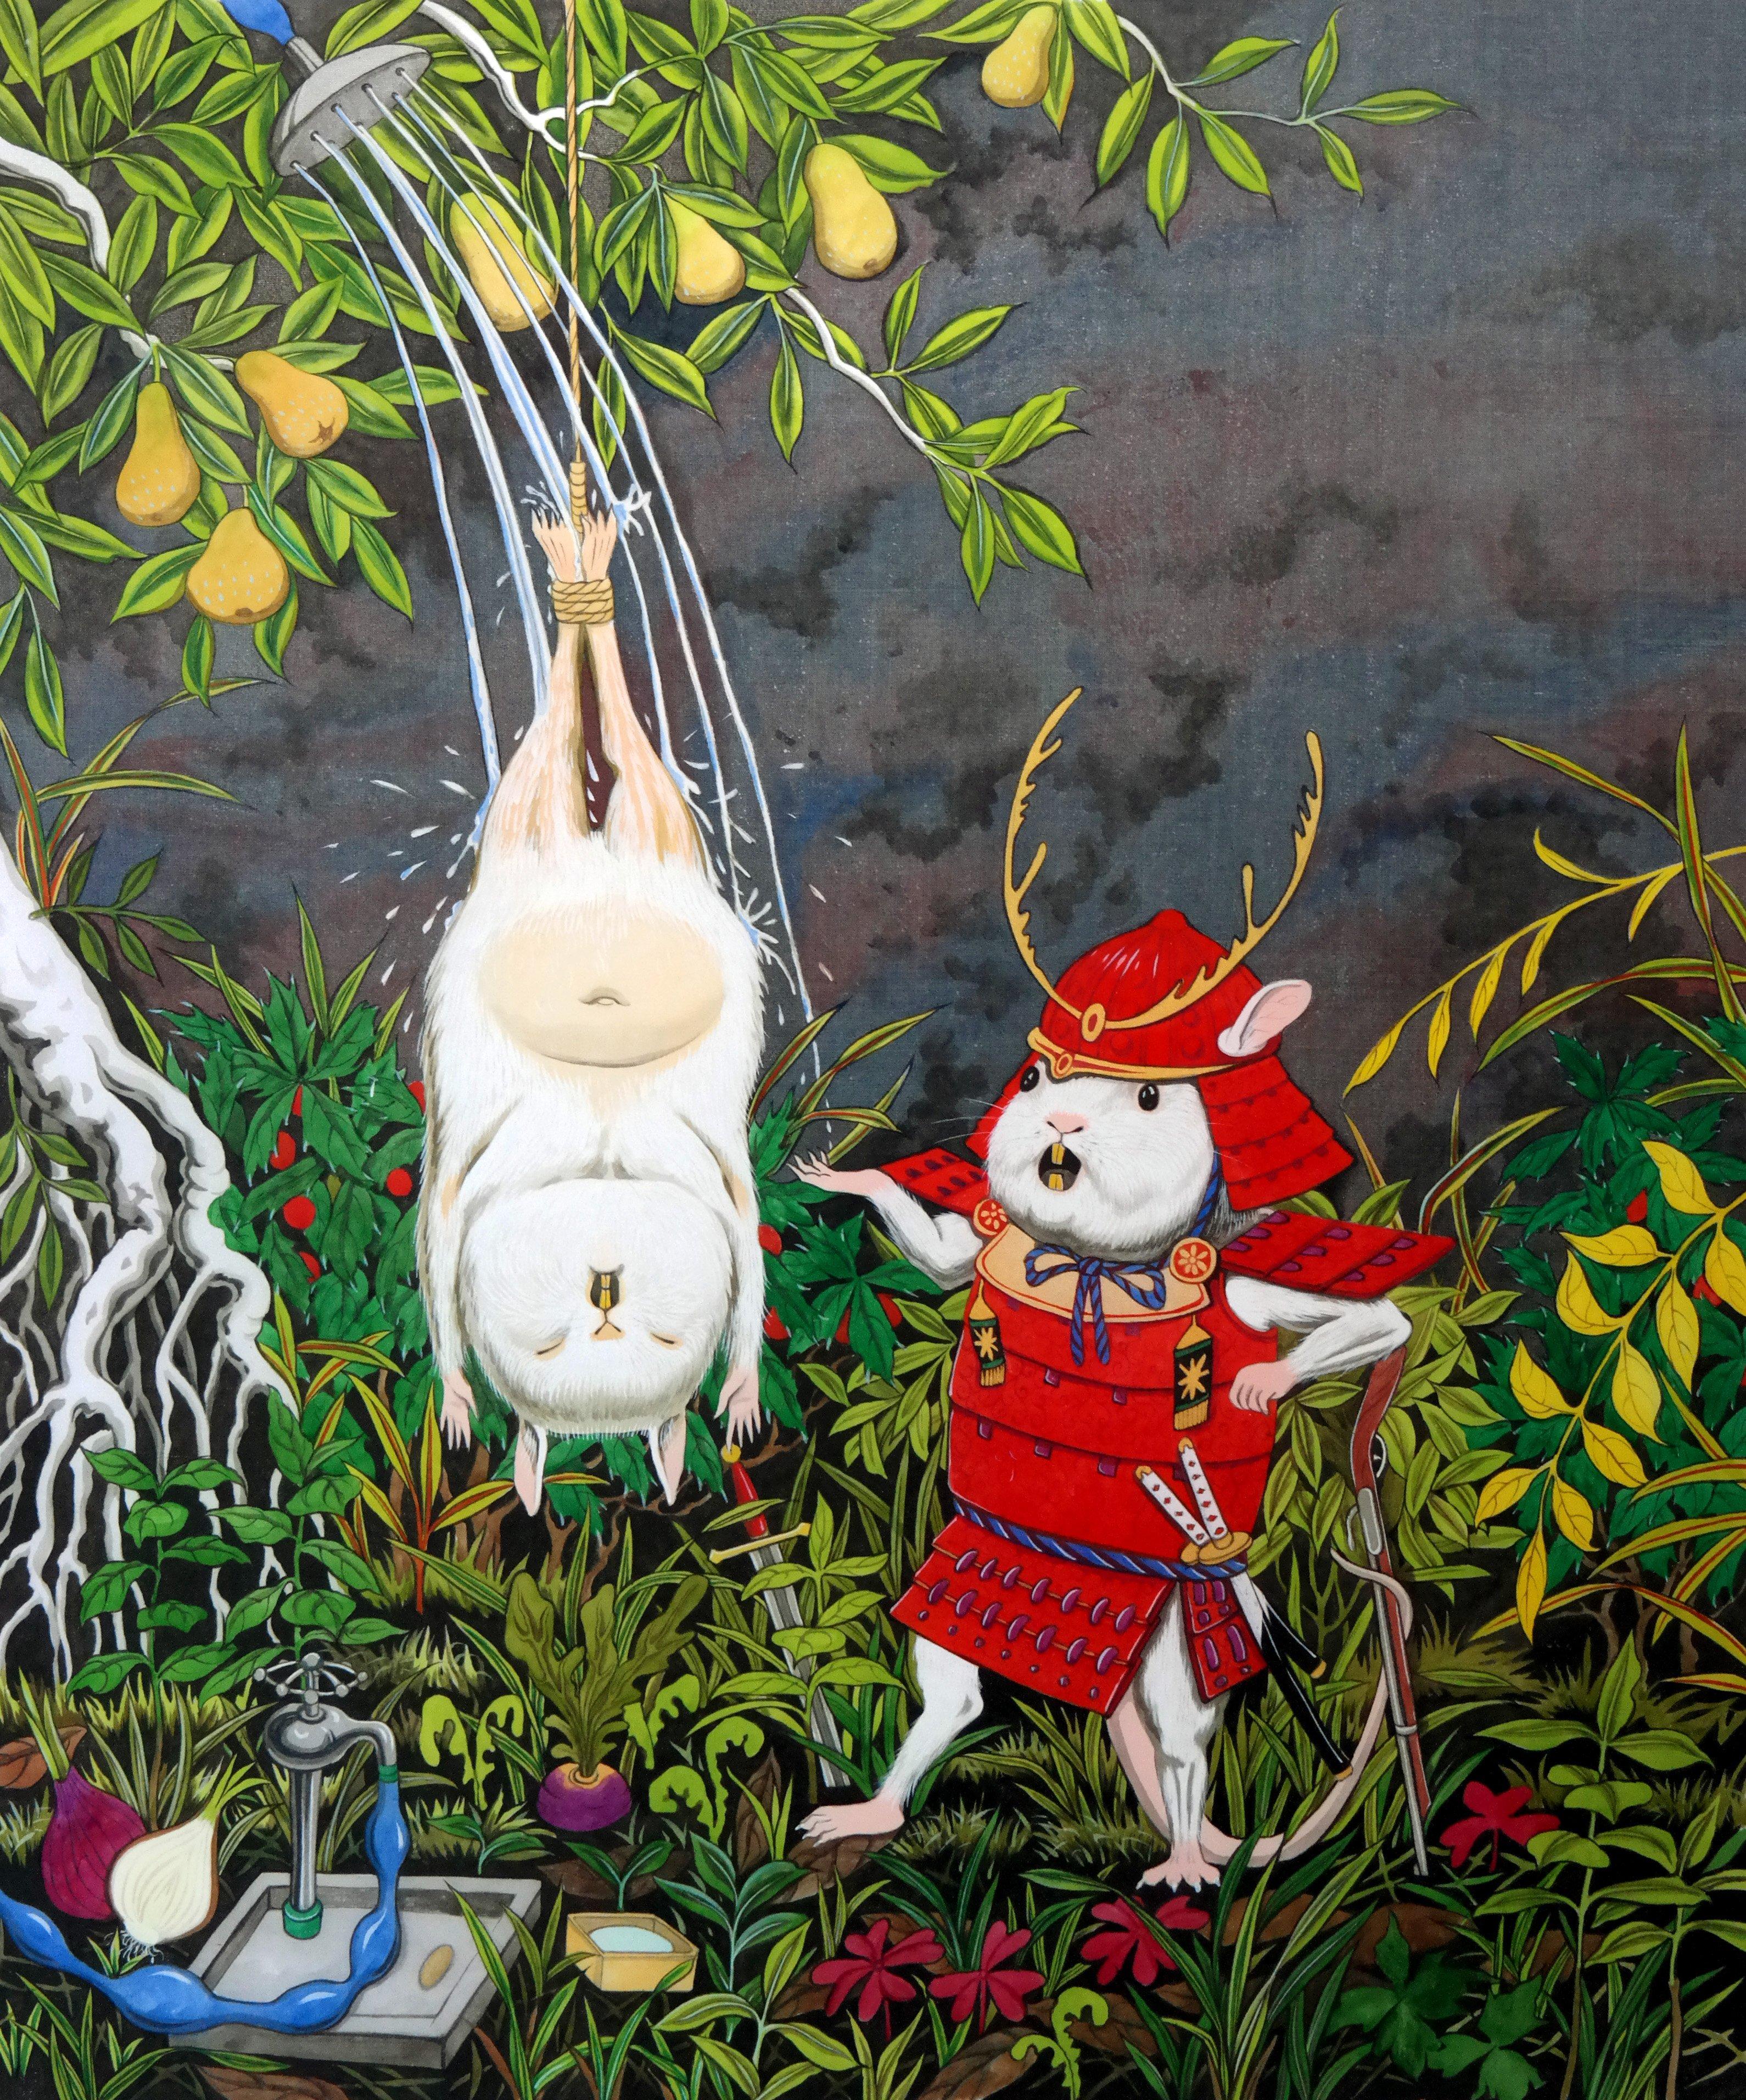 """Homage to Bill Viola"" by Hun Kyu Kim, traditional oriental pigment on silk, 38X49cm, 2017"